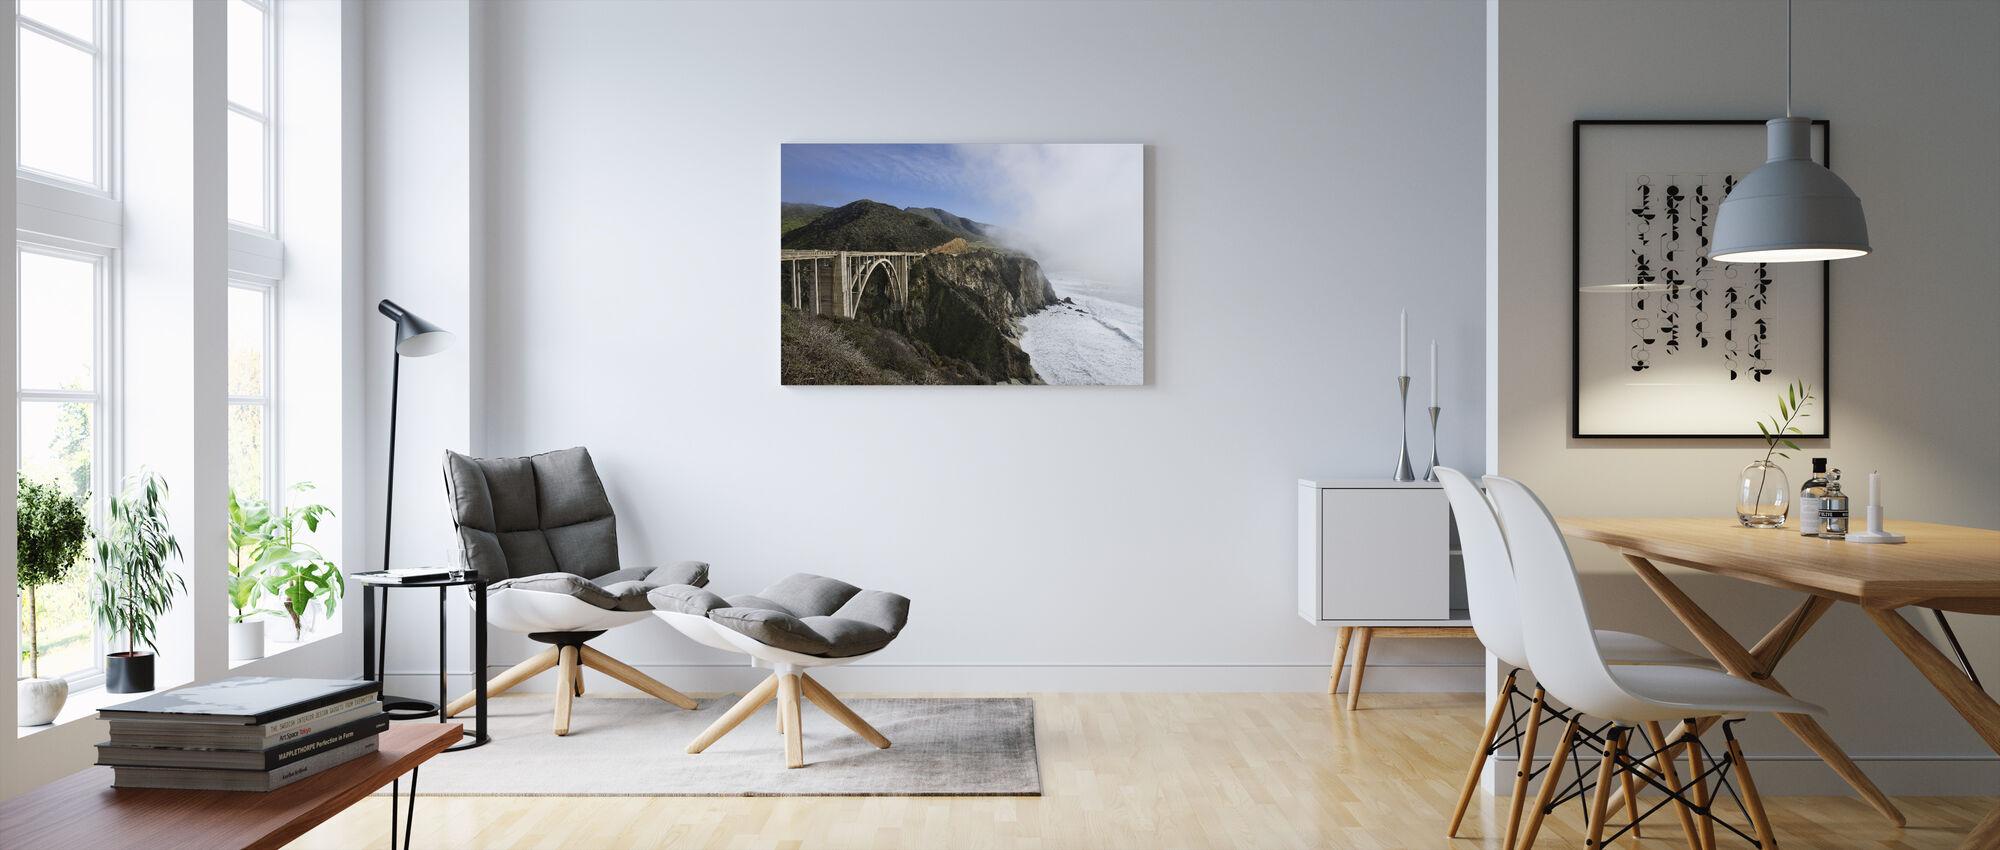 Californian Waves at Bixby Bridge - Canvas print - Living Room